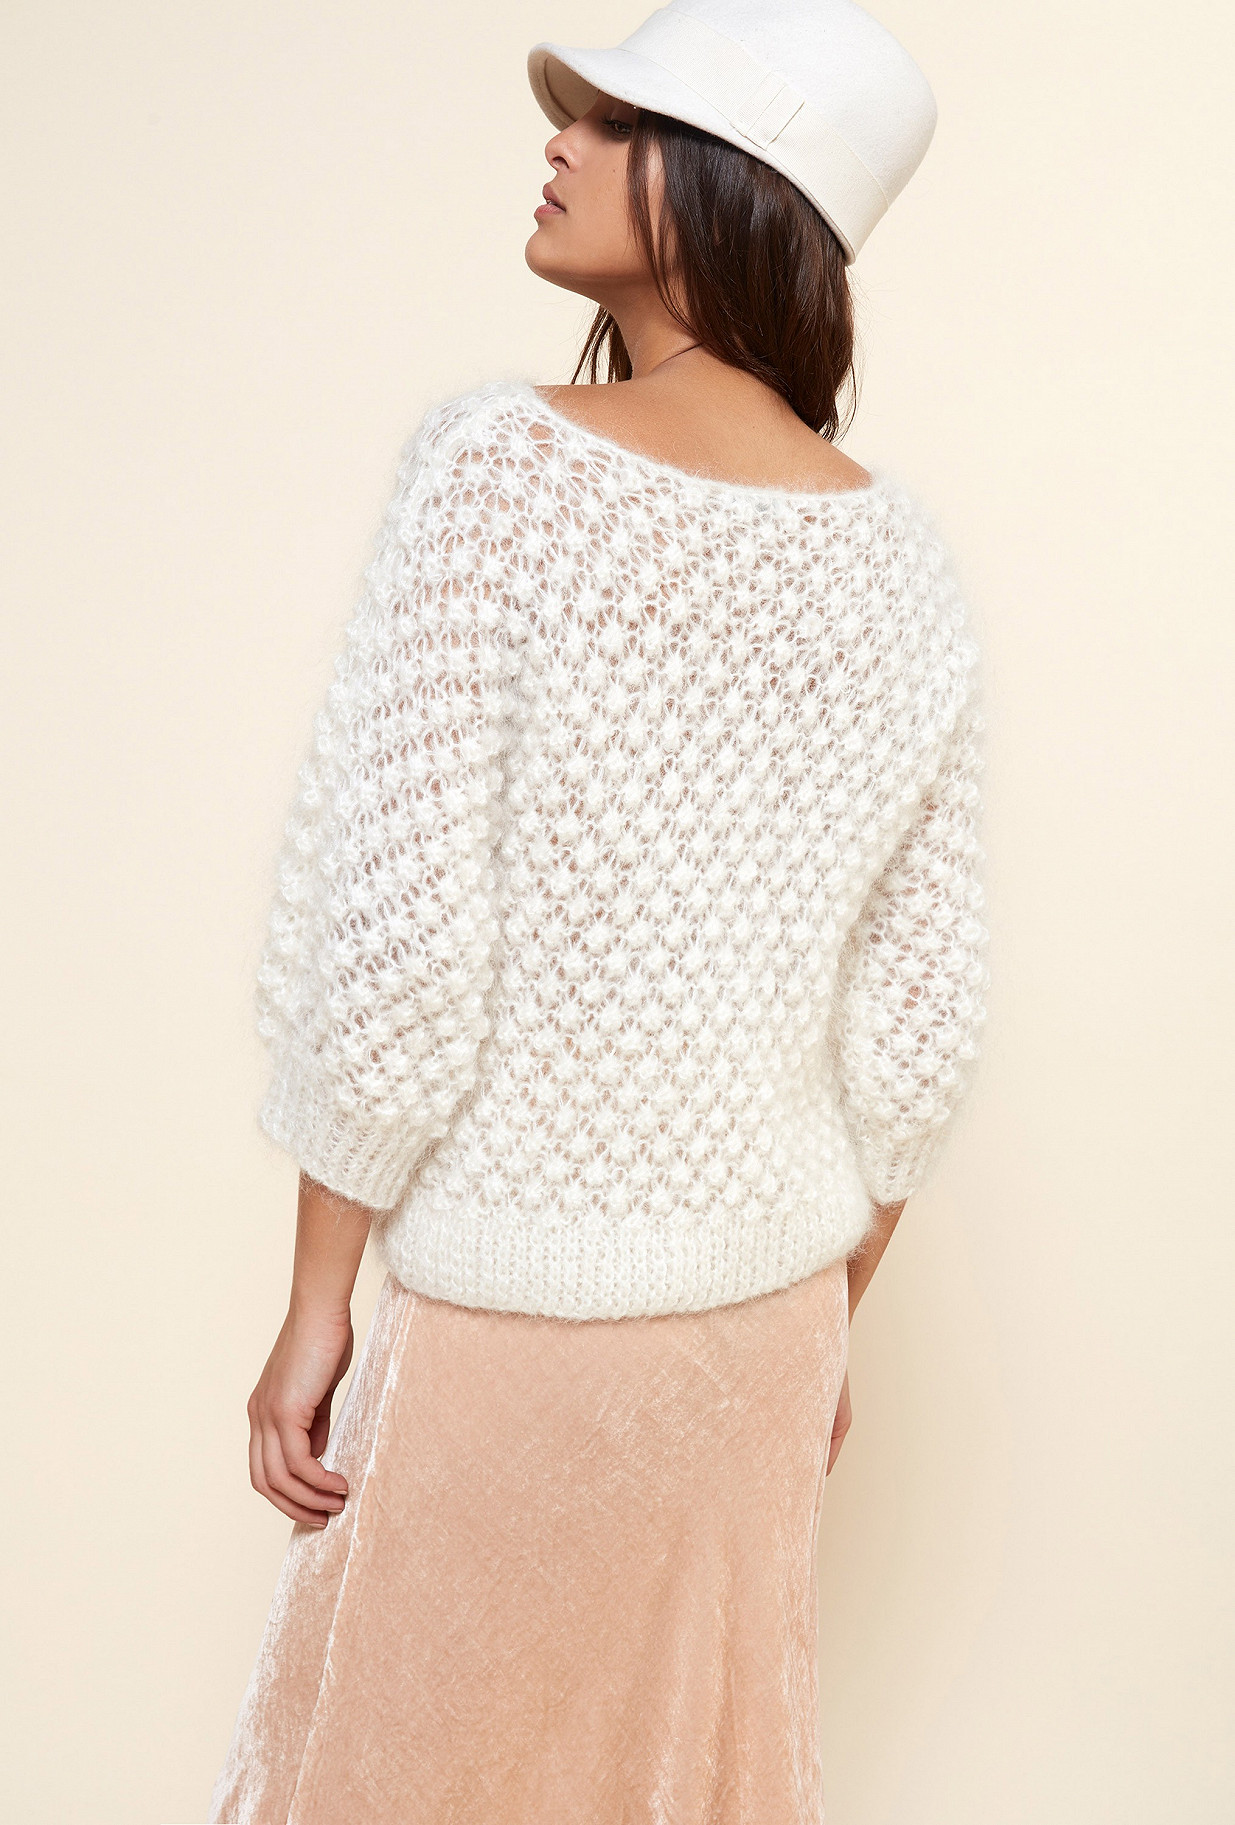 Ivory Sweater Snow Flake Mes Demoiselles Paris